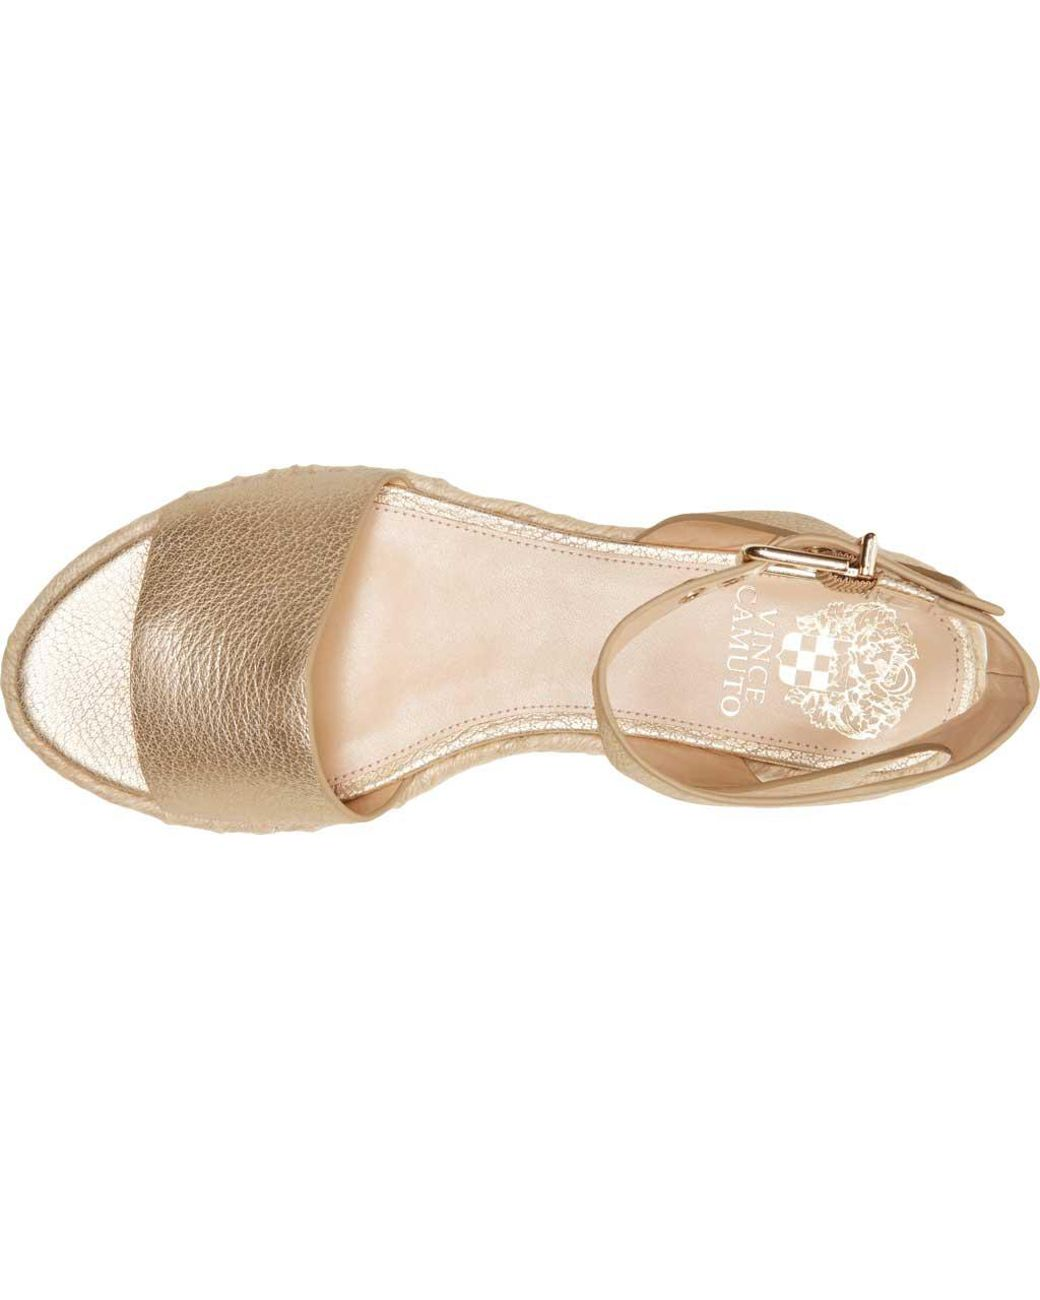 b60b8dfc737 Lyst - Vince Camuto Kathalia Metallic Leather Flatform Espadrille Sandals  in Metallic - Save 45%